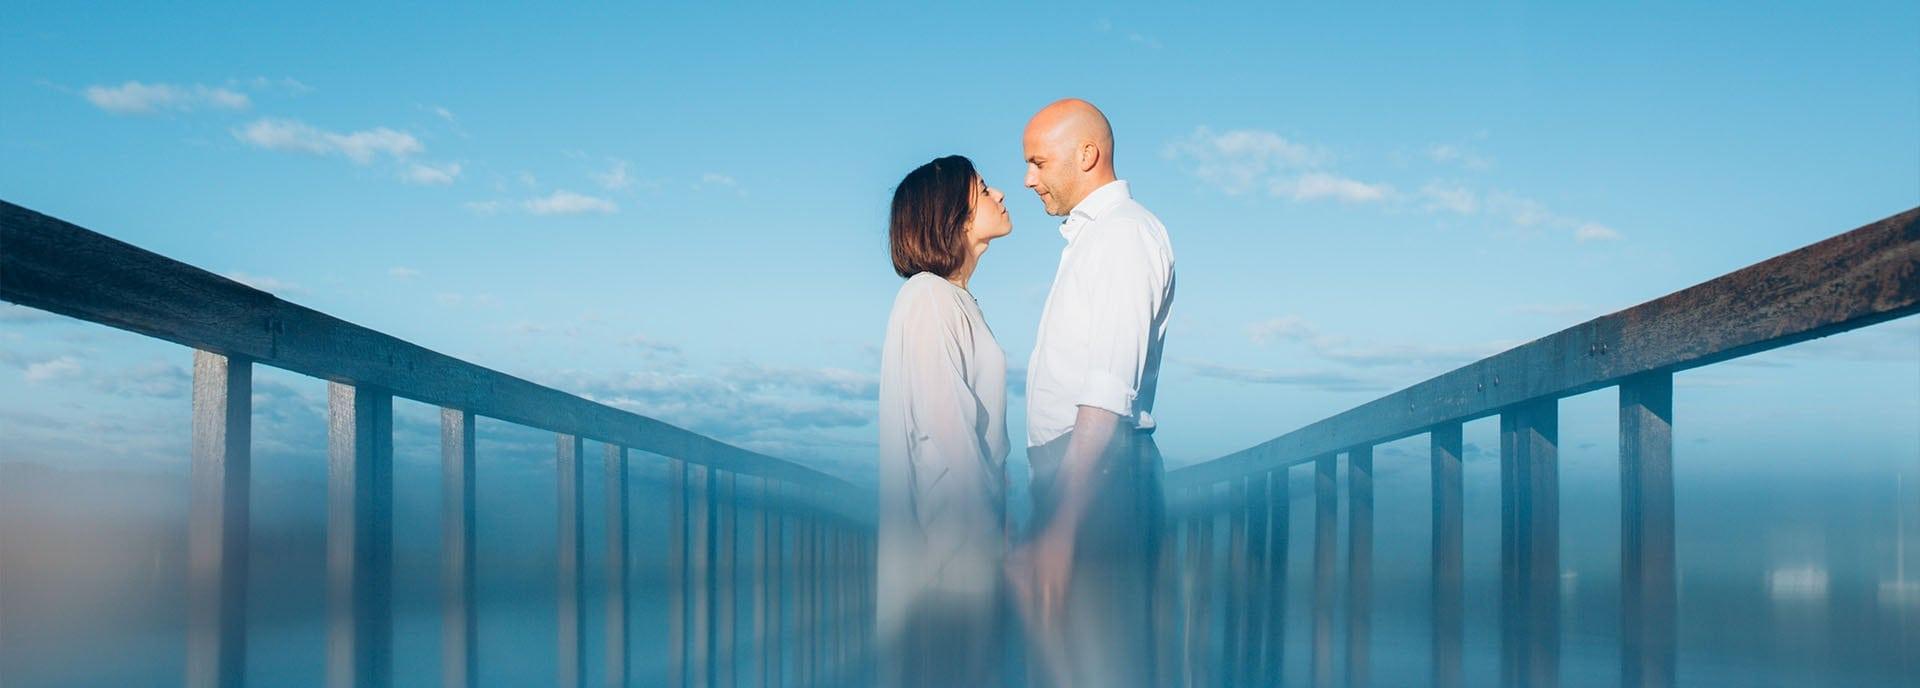 Matrimonio Spiaggia Lignano : Fotografo matrimonio udine treviso veneto mayda mason